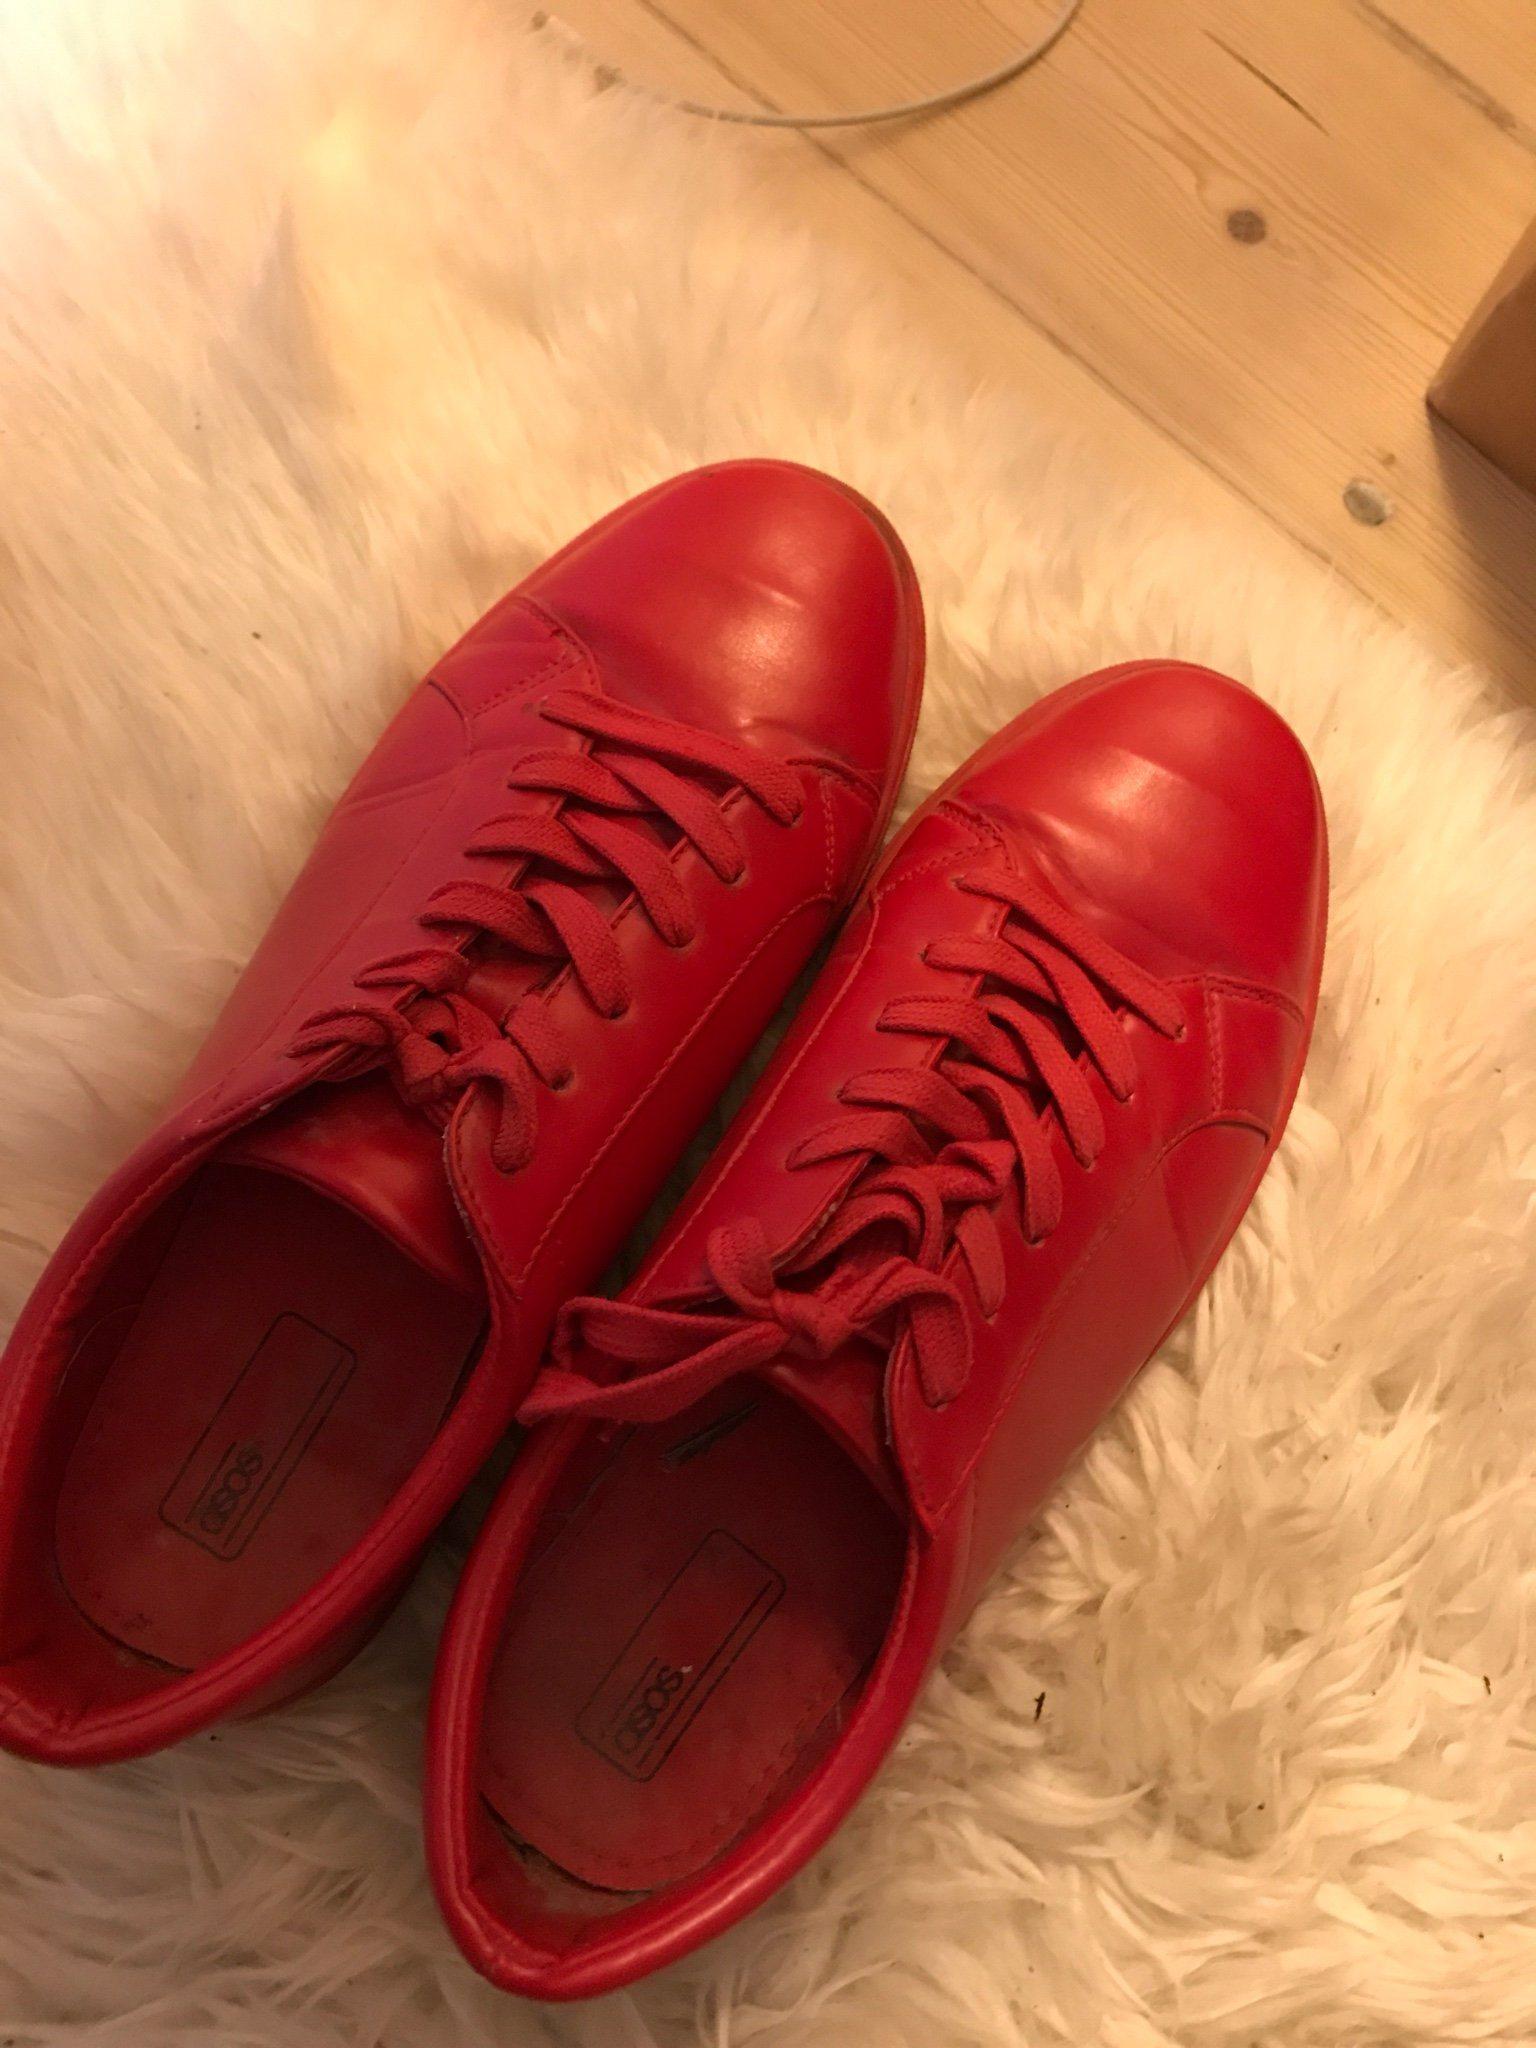 buy online 12db5 4b38e Röda sneakers herr